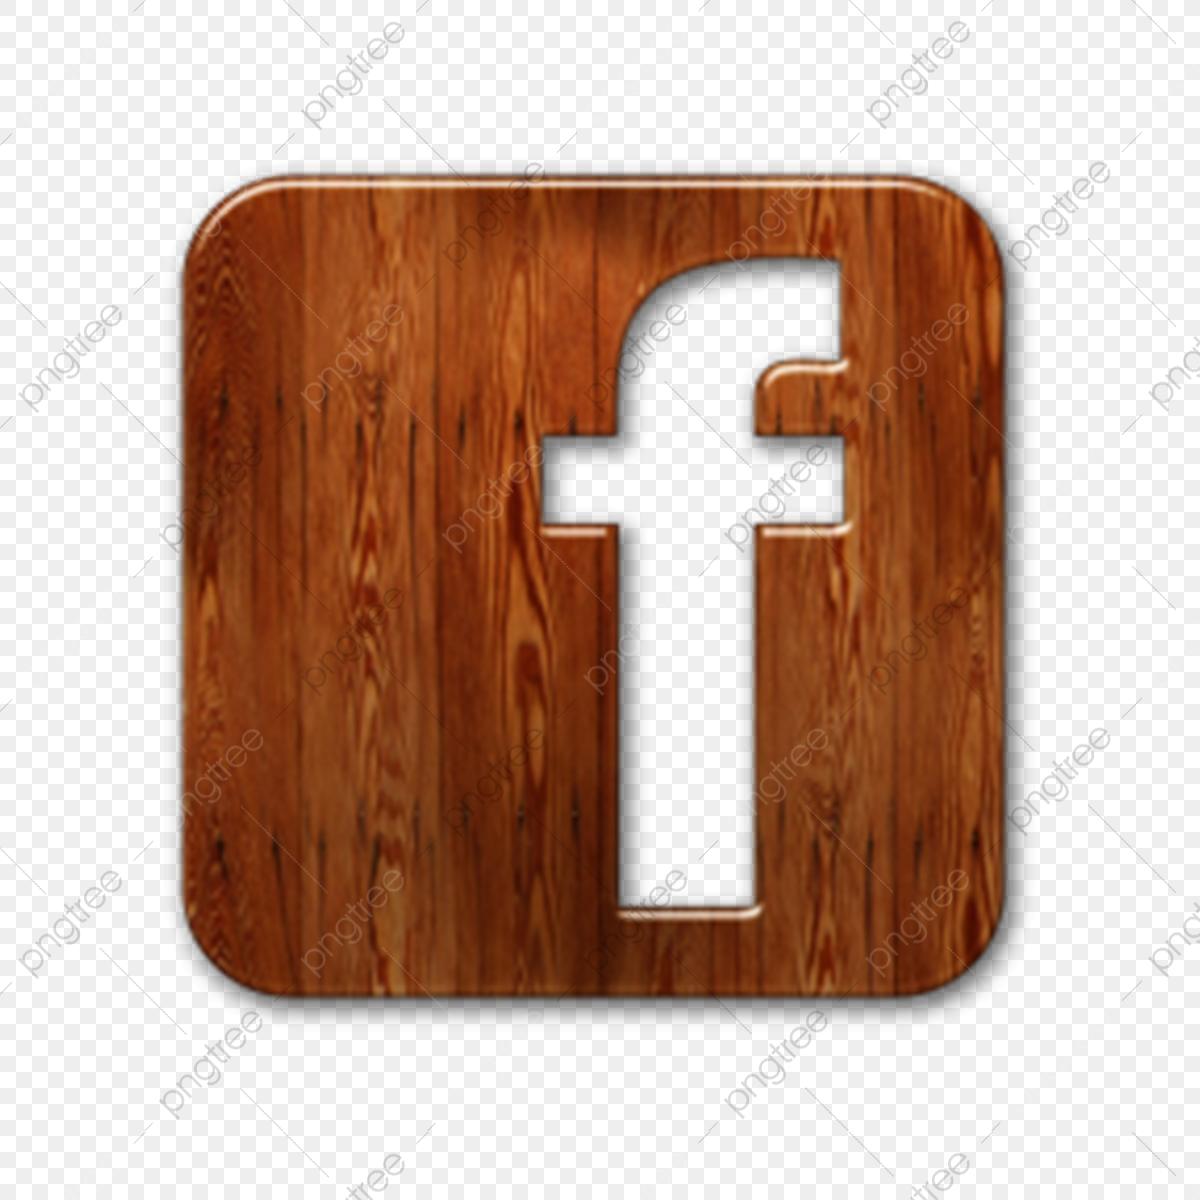 F trademark background design. Facebook clipart material